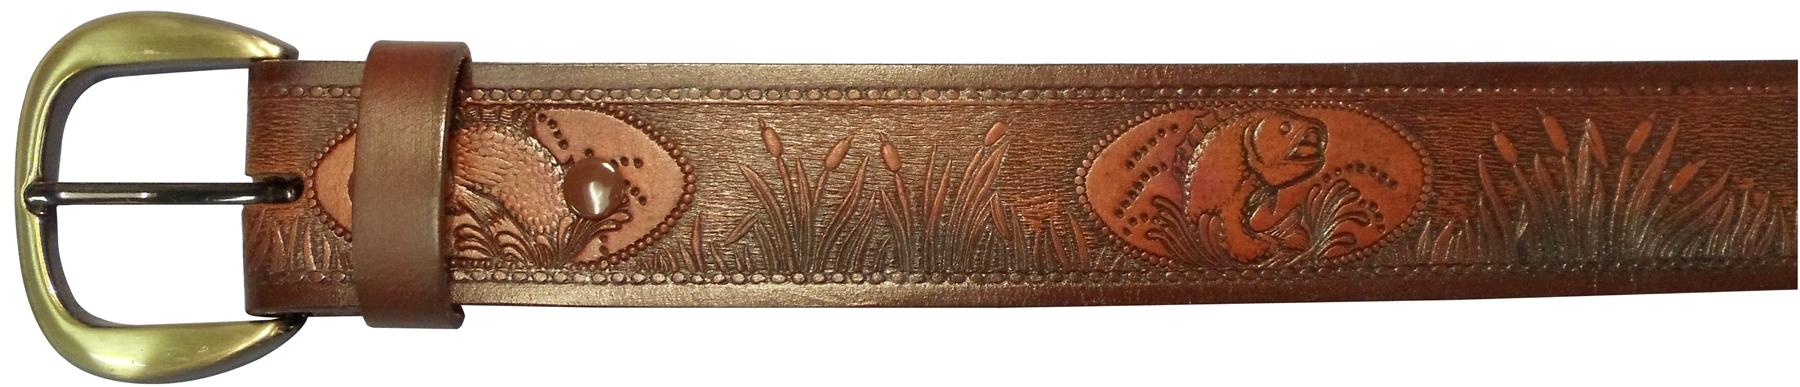 "10610170236 - 36"" Brown Leather Belt Fish Design"